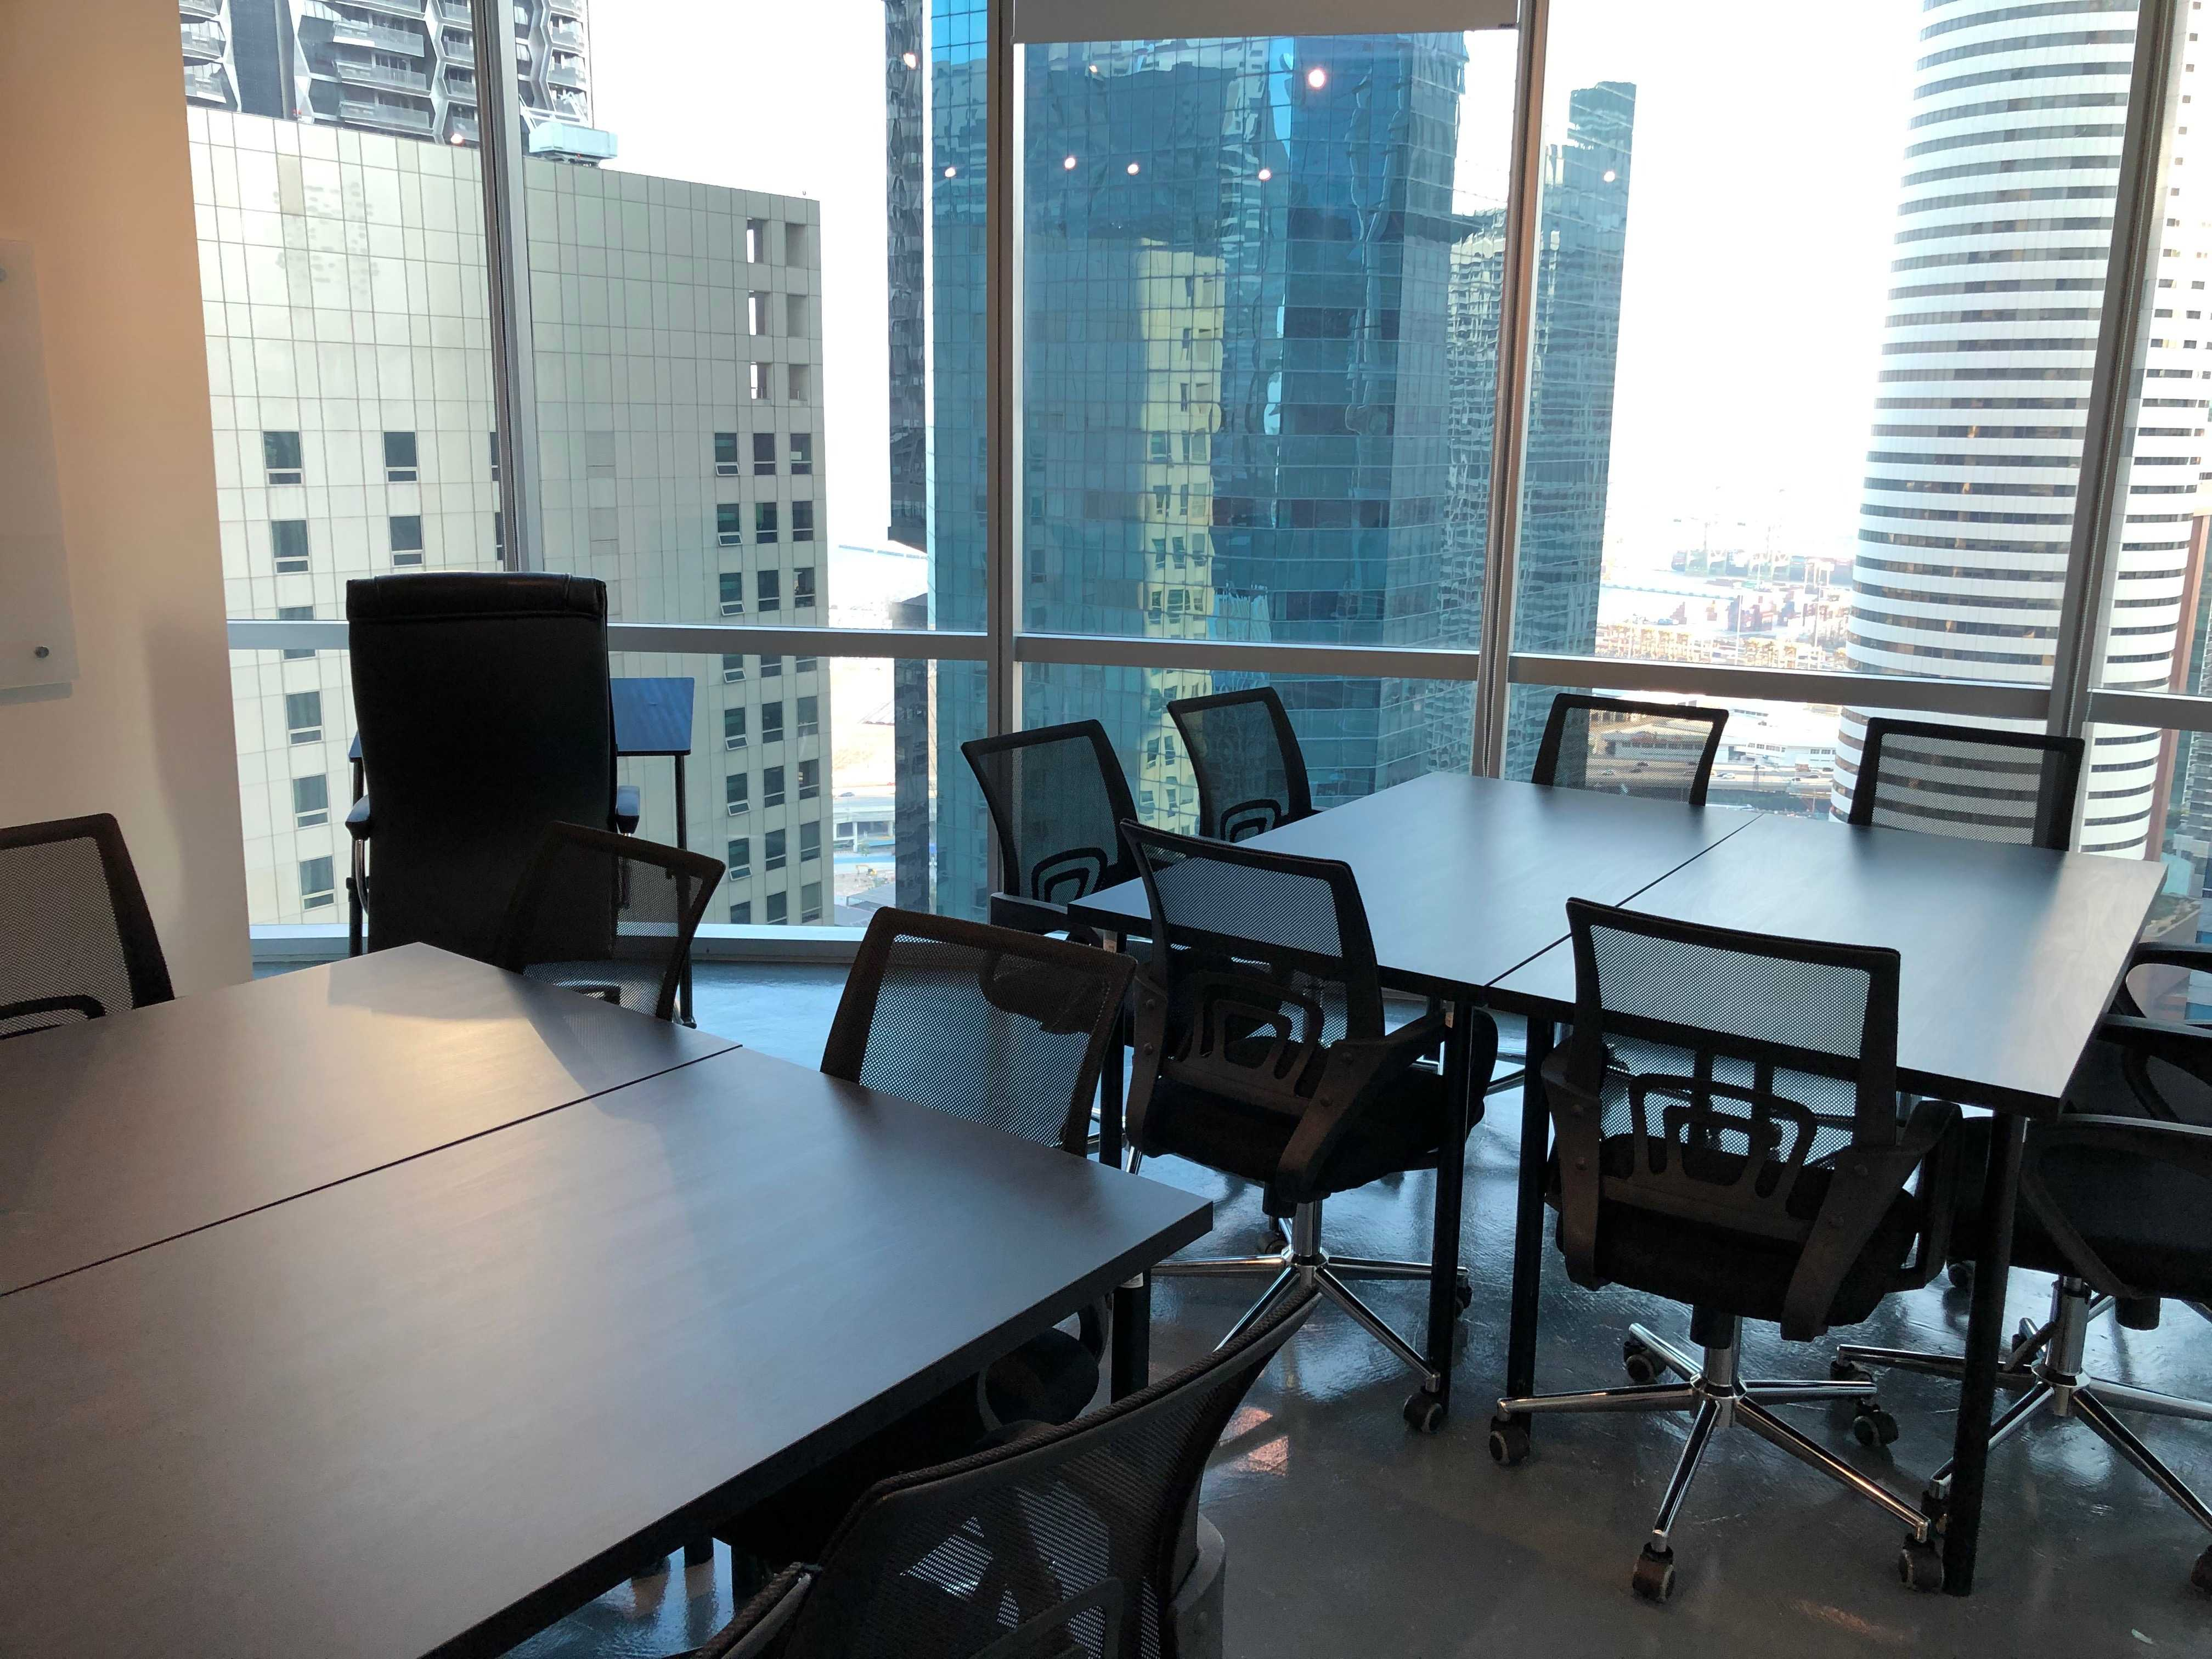 Classroom,Meeting,Training Room Rental in Singapore